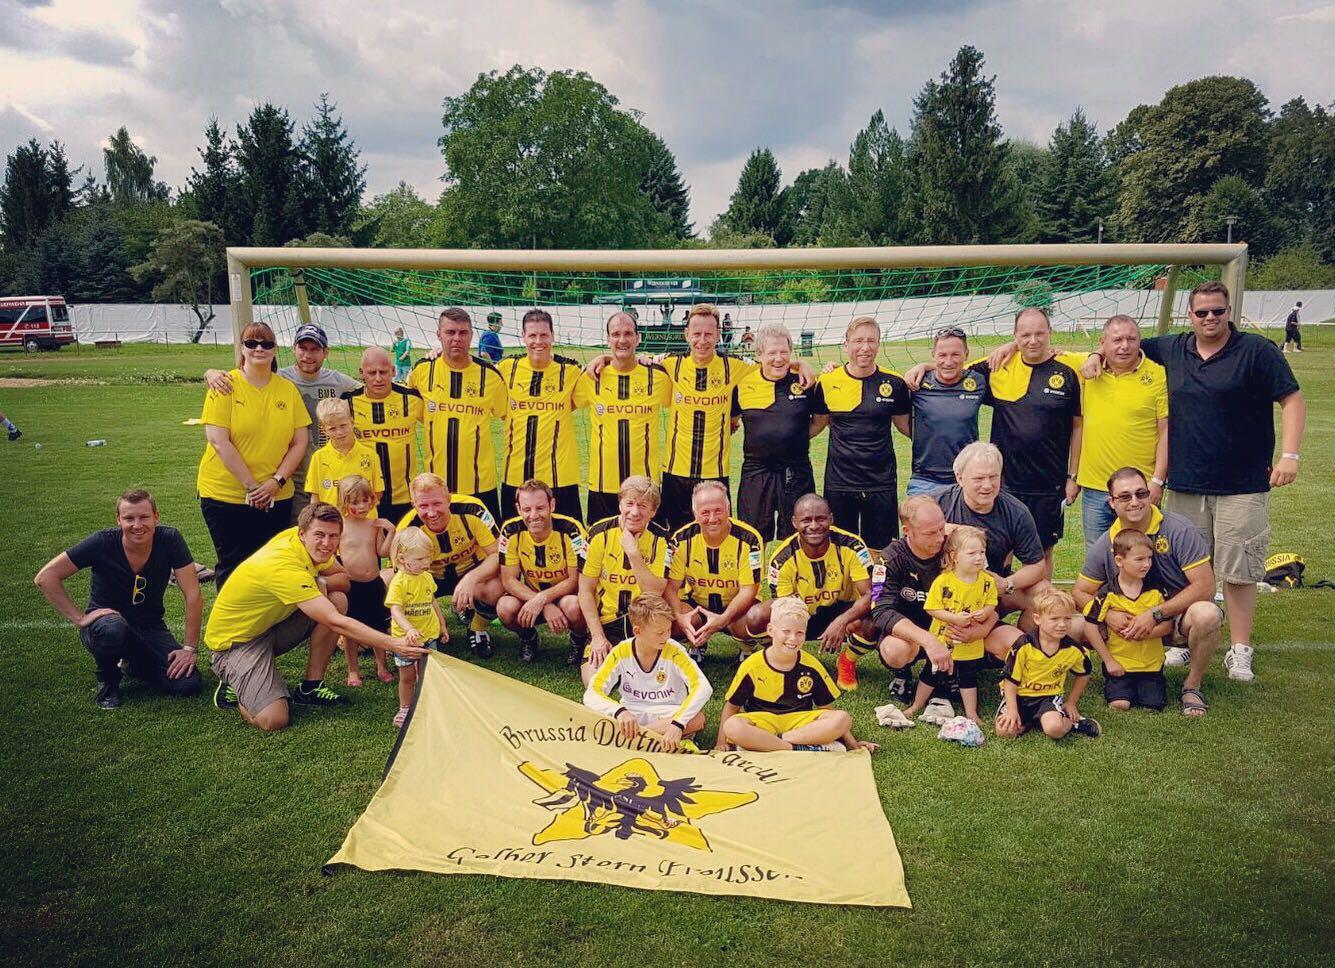 Sommerfest & Benefiz-Fußballturnier der Kolibri – Hilfe für krebskranke Kinder e.V.